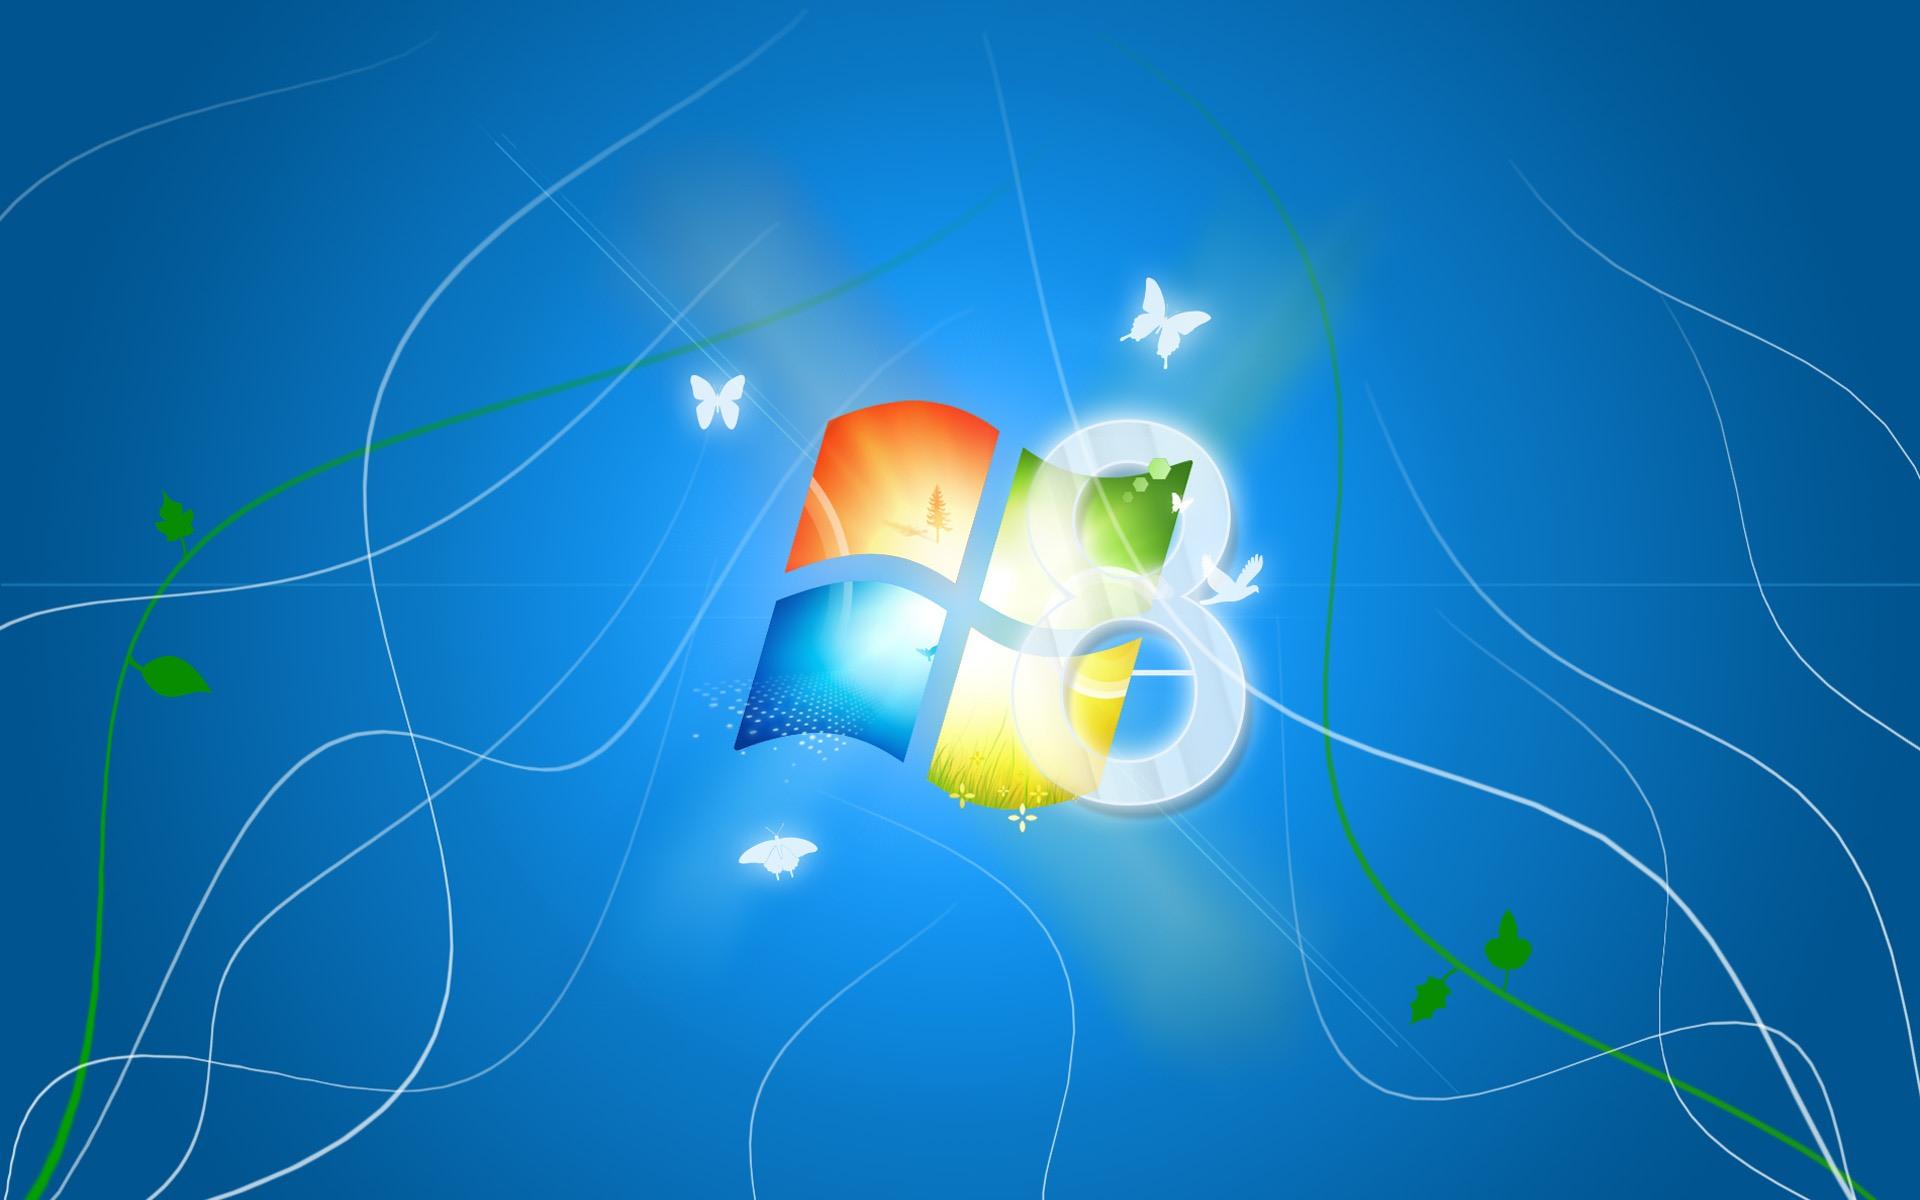 Windowsの8テーマの壁紙 2 5 19x10 壁紙ダウンロード Windowsの8テーマの壁紙 2 システム 壁紙 V3の壁紙